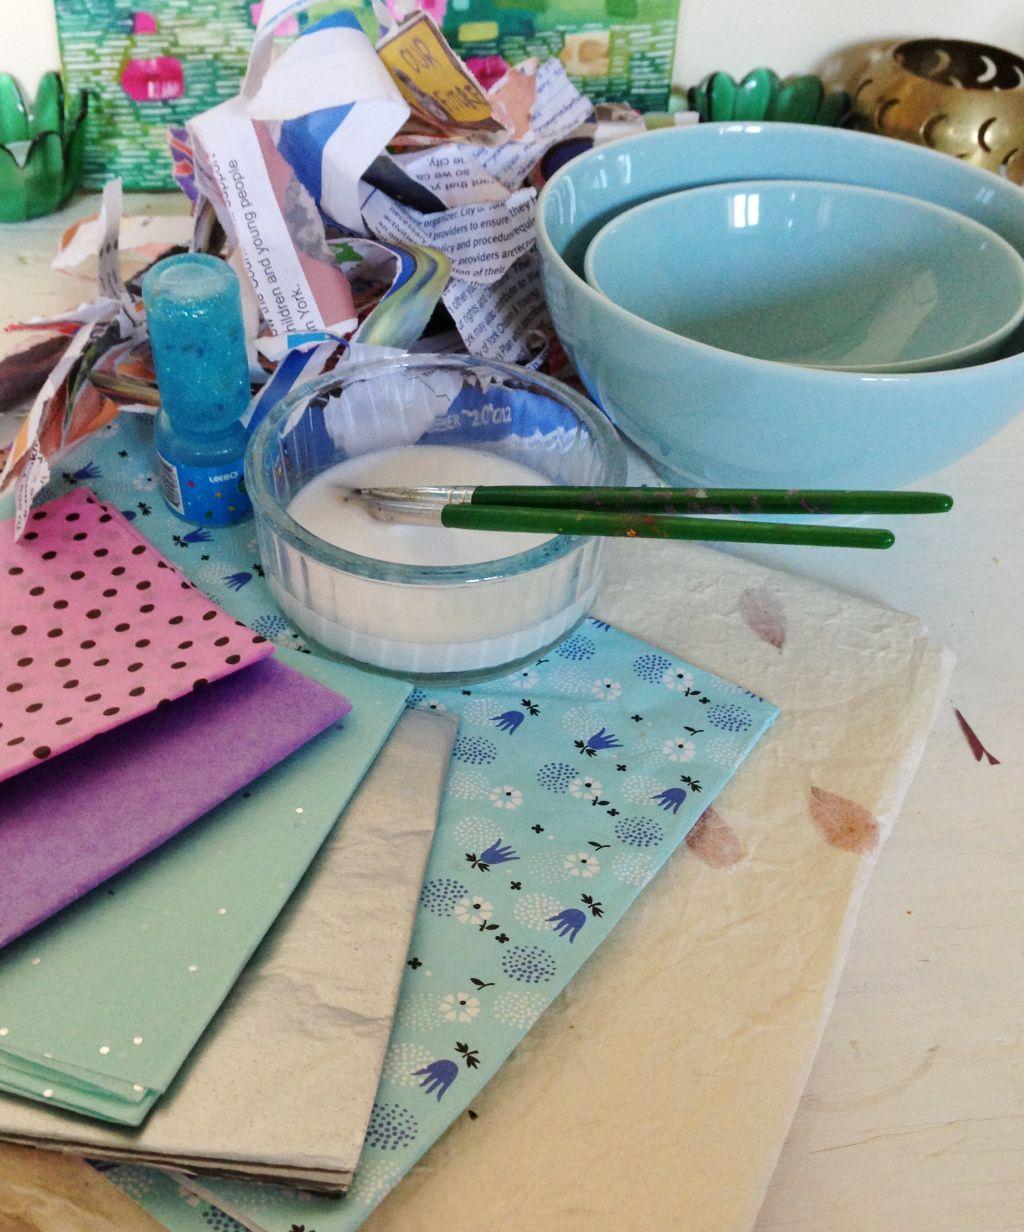 Paper Mache Materials